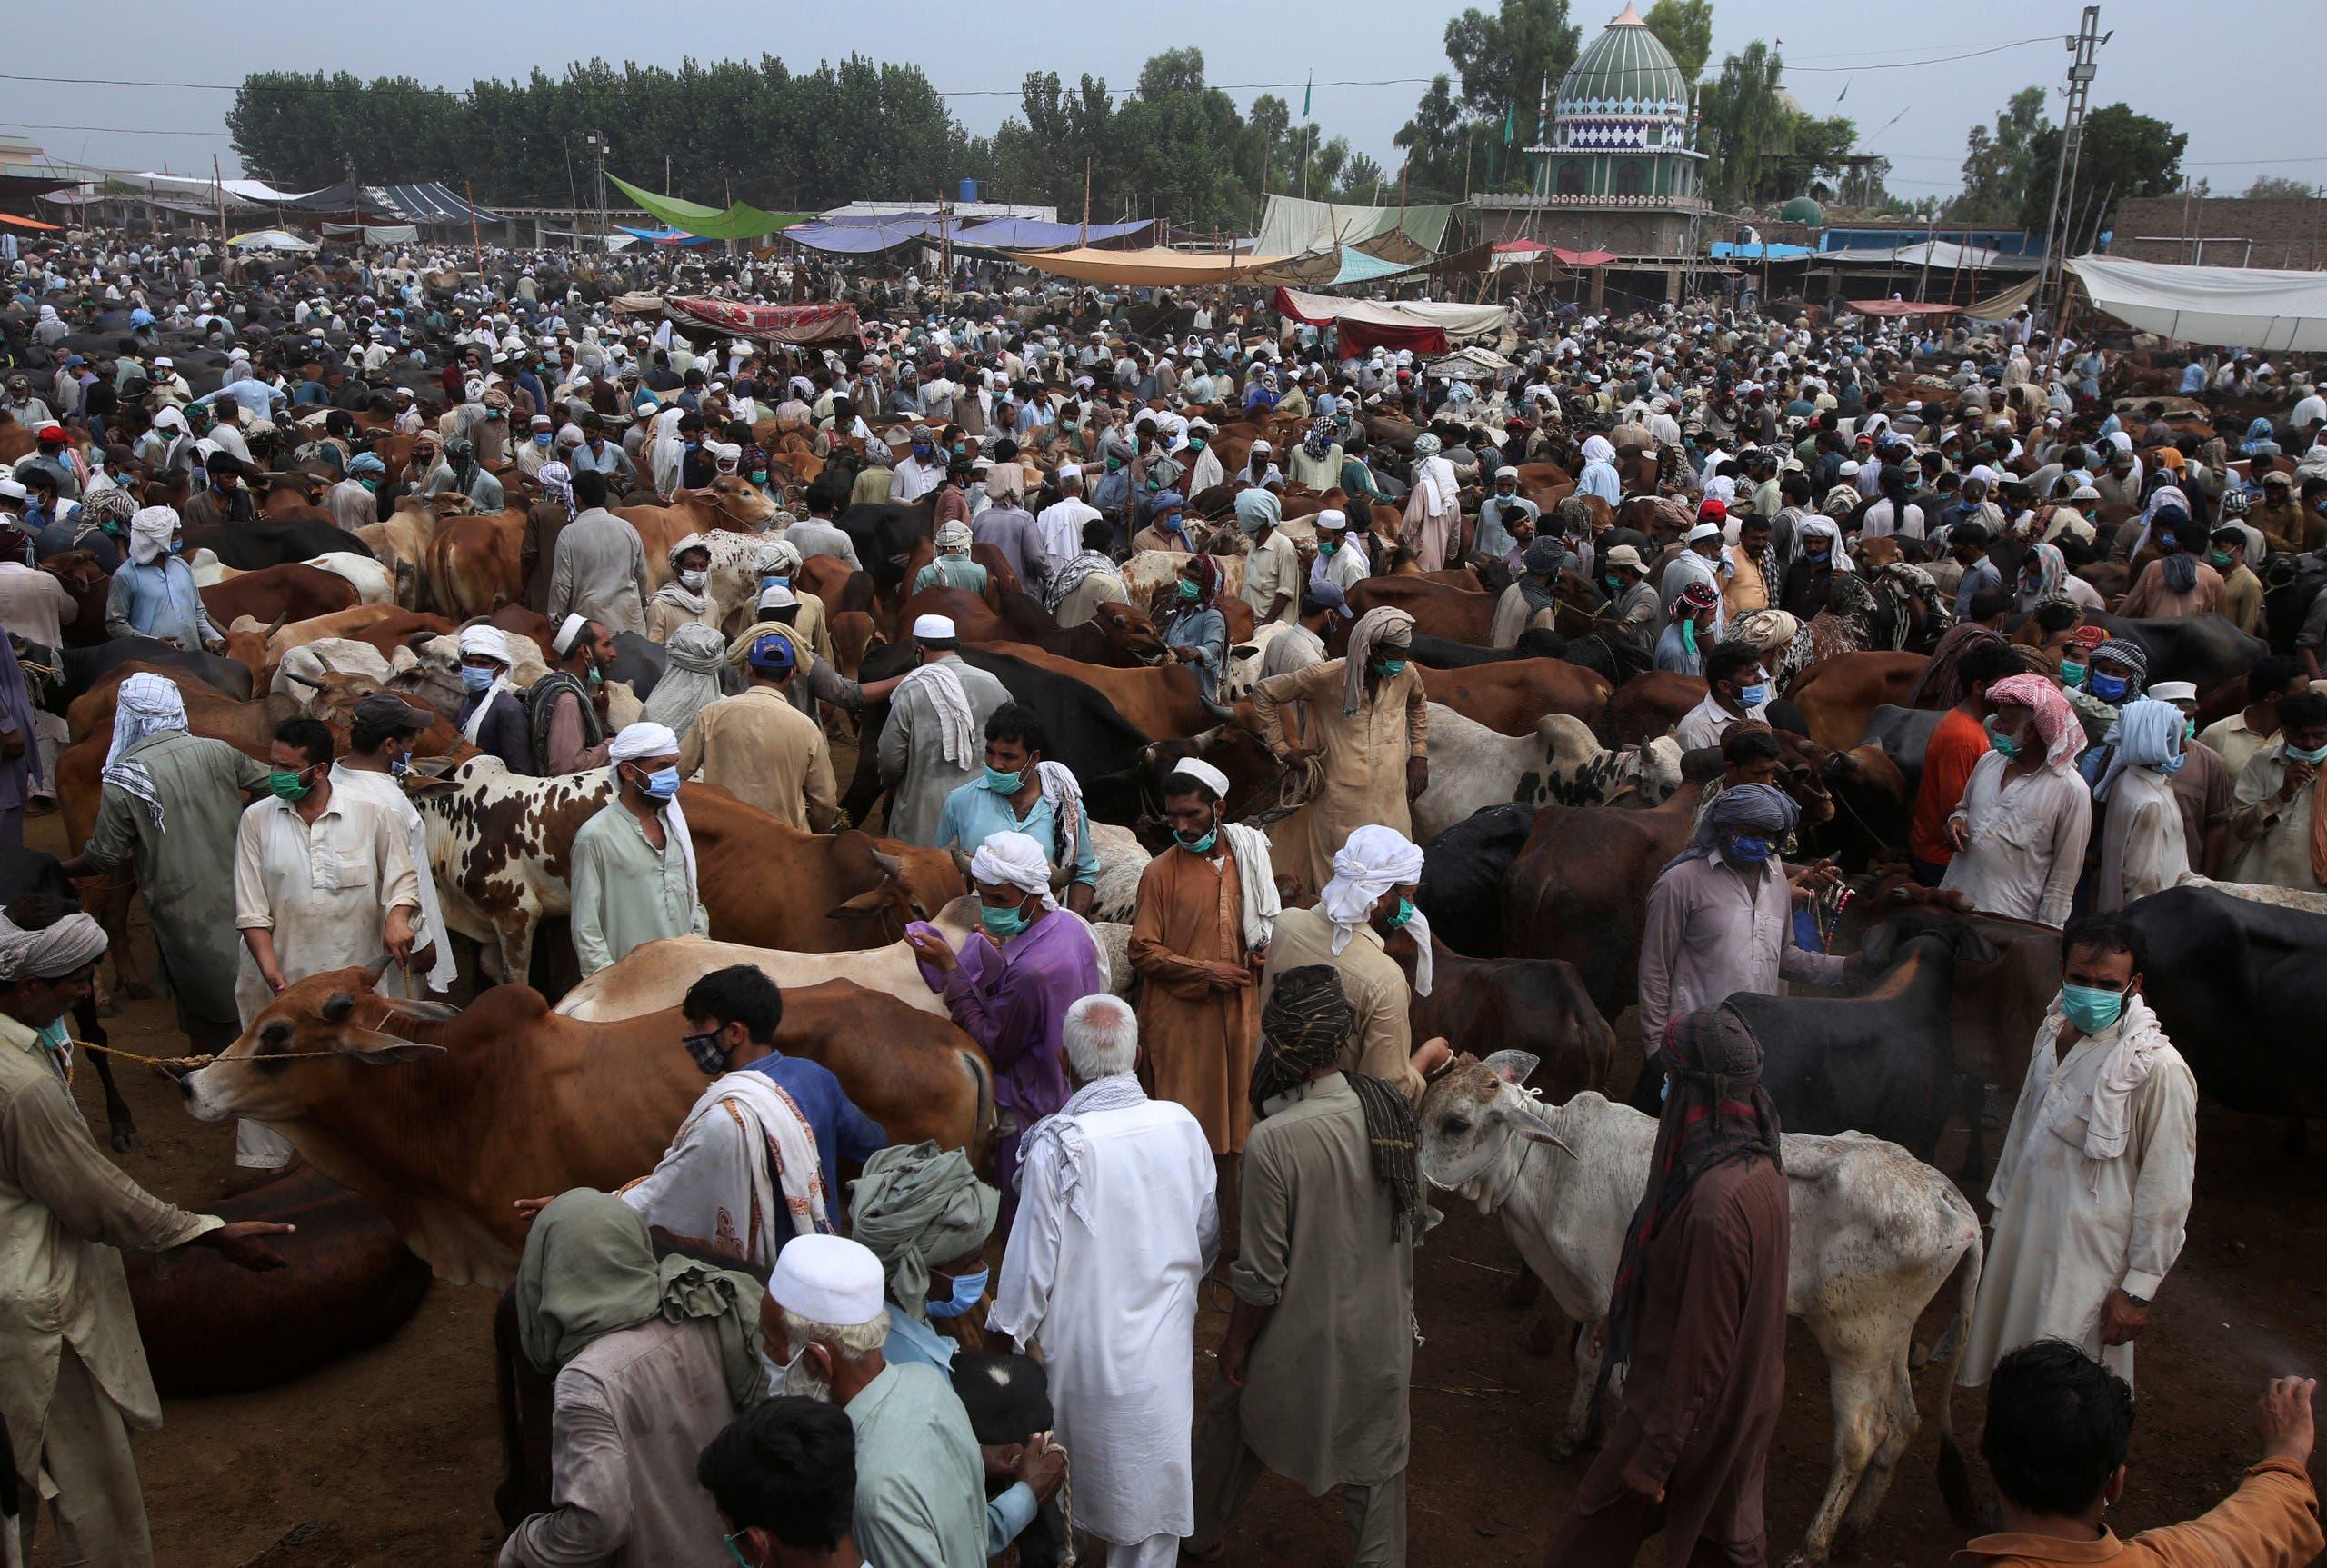 A livestock market in Peshawar, Pakistan, July 4, 2020, ahead of Eid al-Adha. (AP)